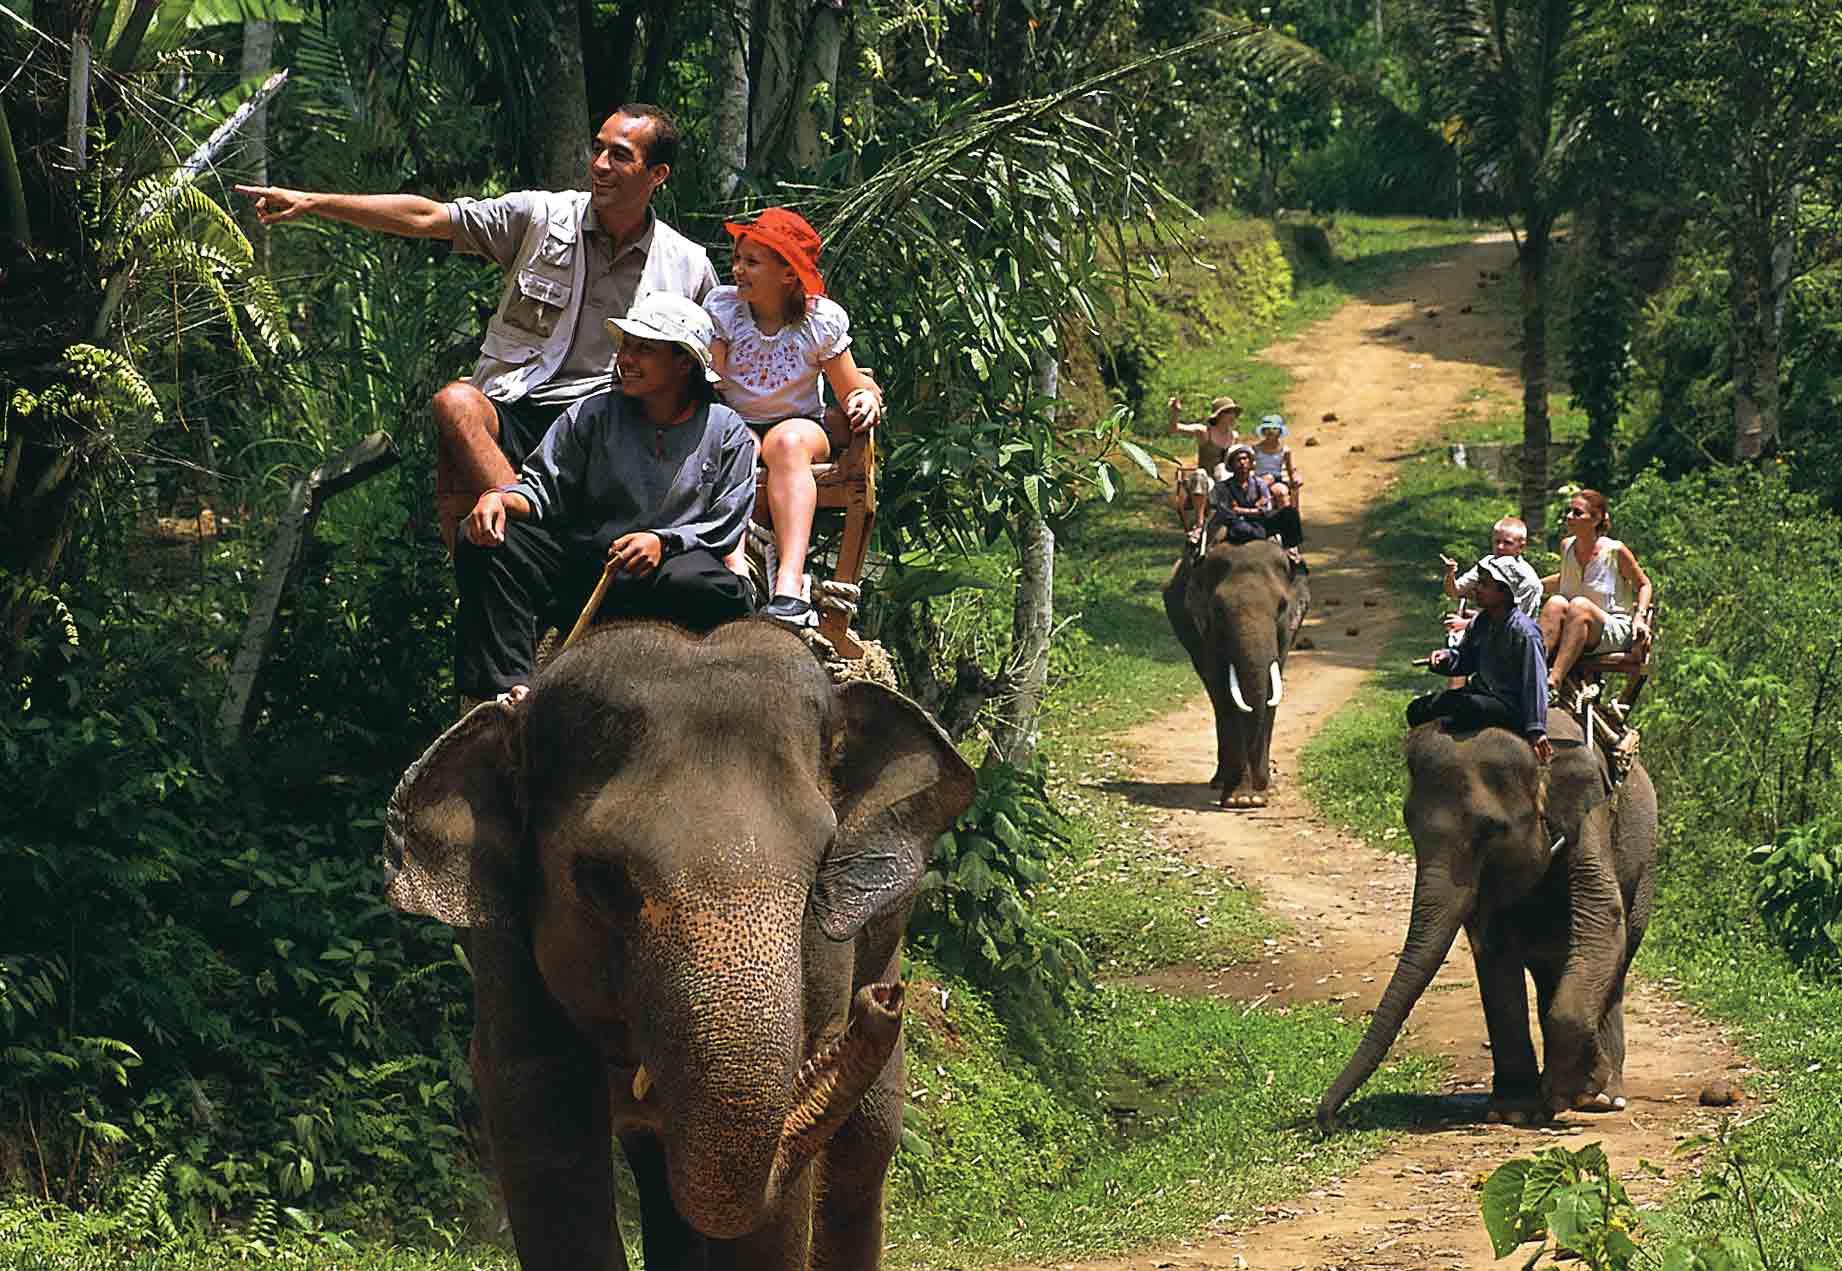 Riding the elephant photo